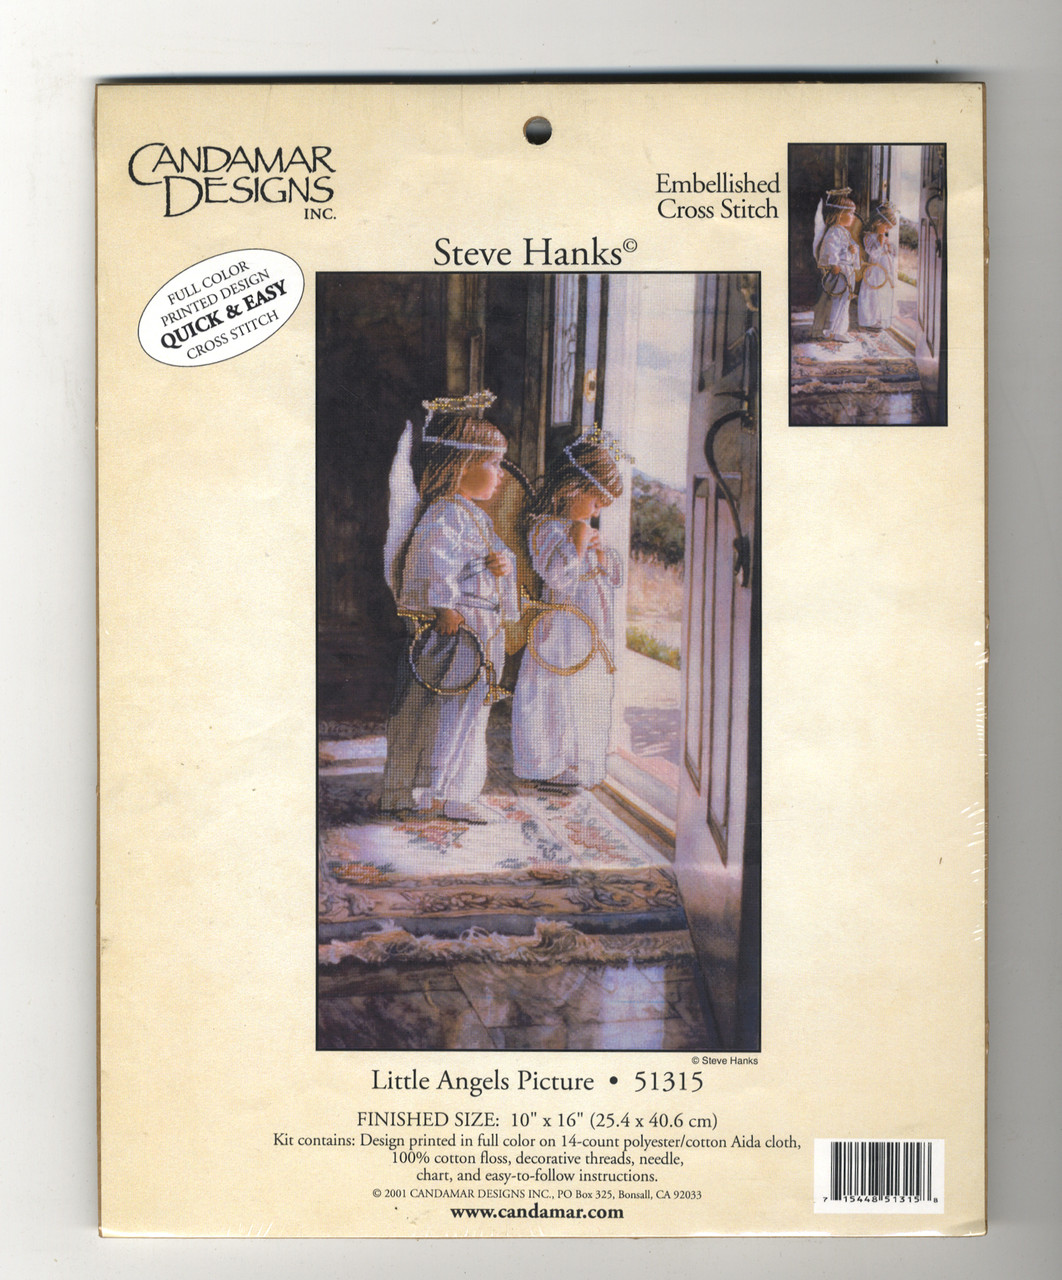 Candamar - Little Angels